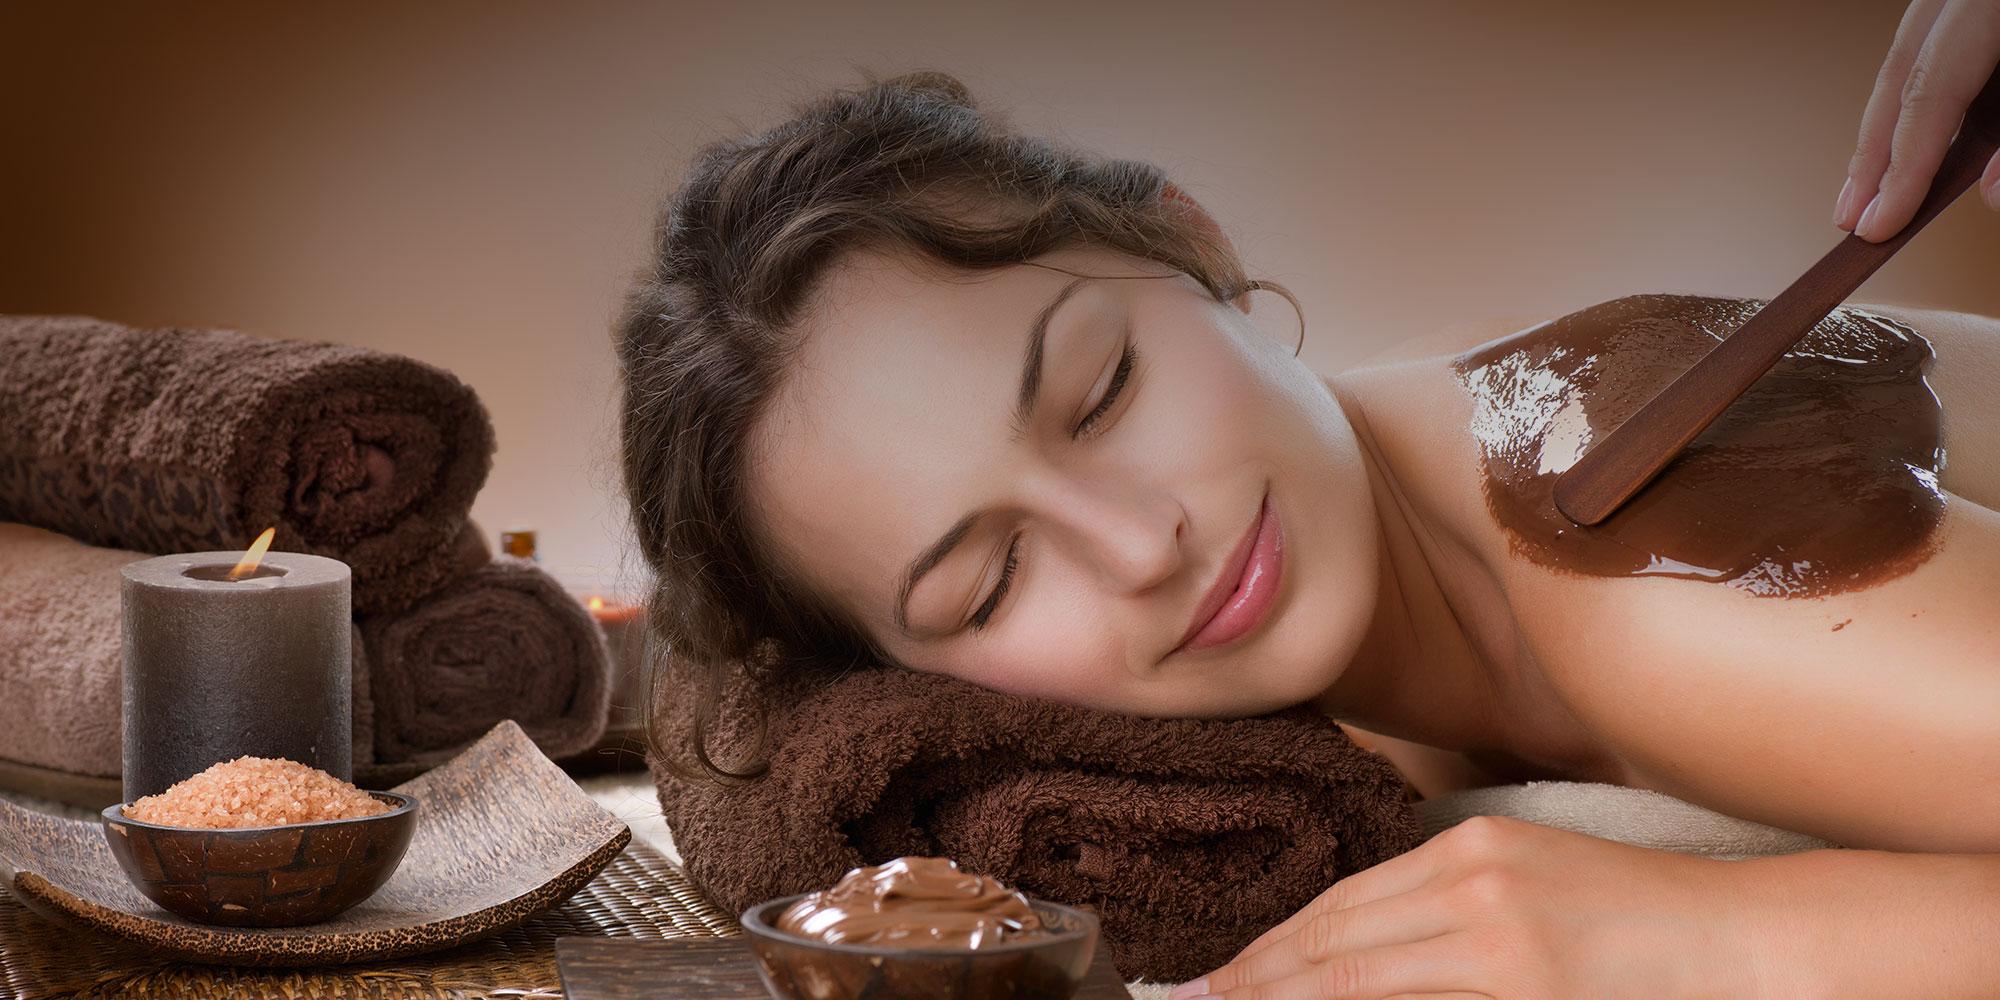 sansiri thai massage spa in port melbourne experience. Black Bedroom Furniture Sets. Home Design Ideas